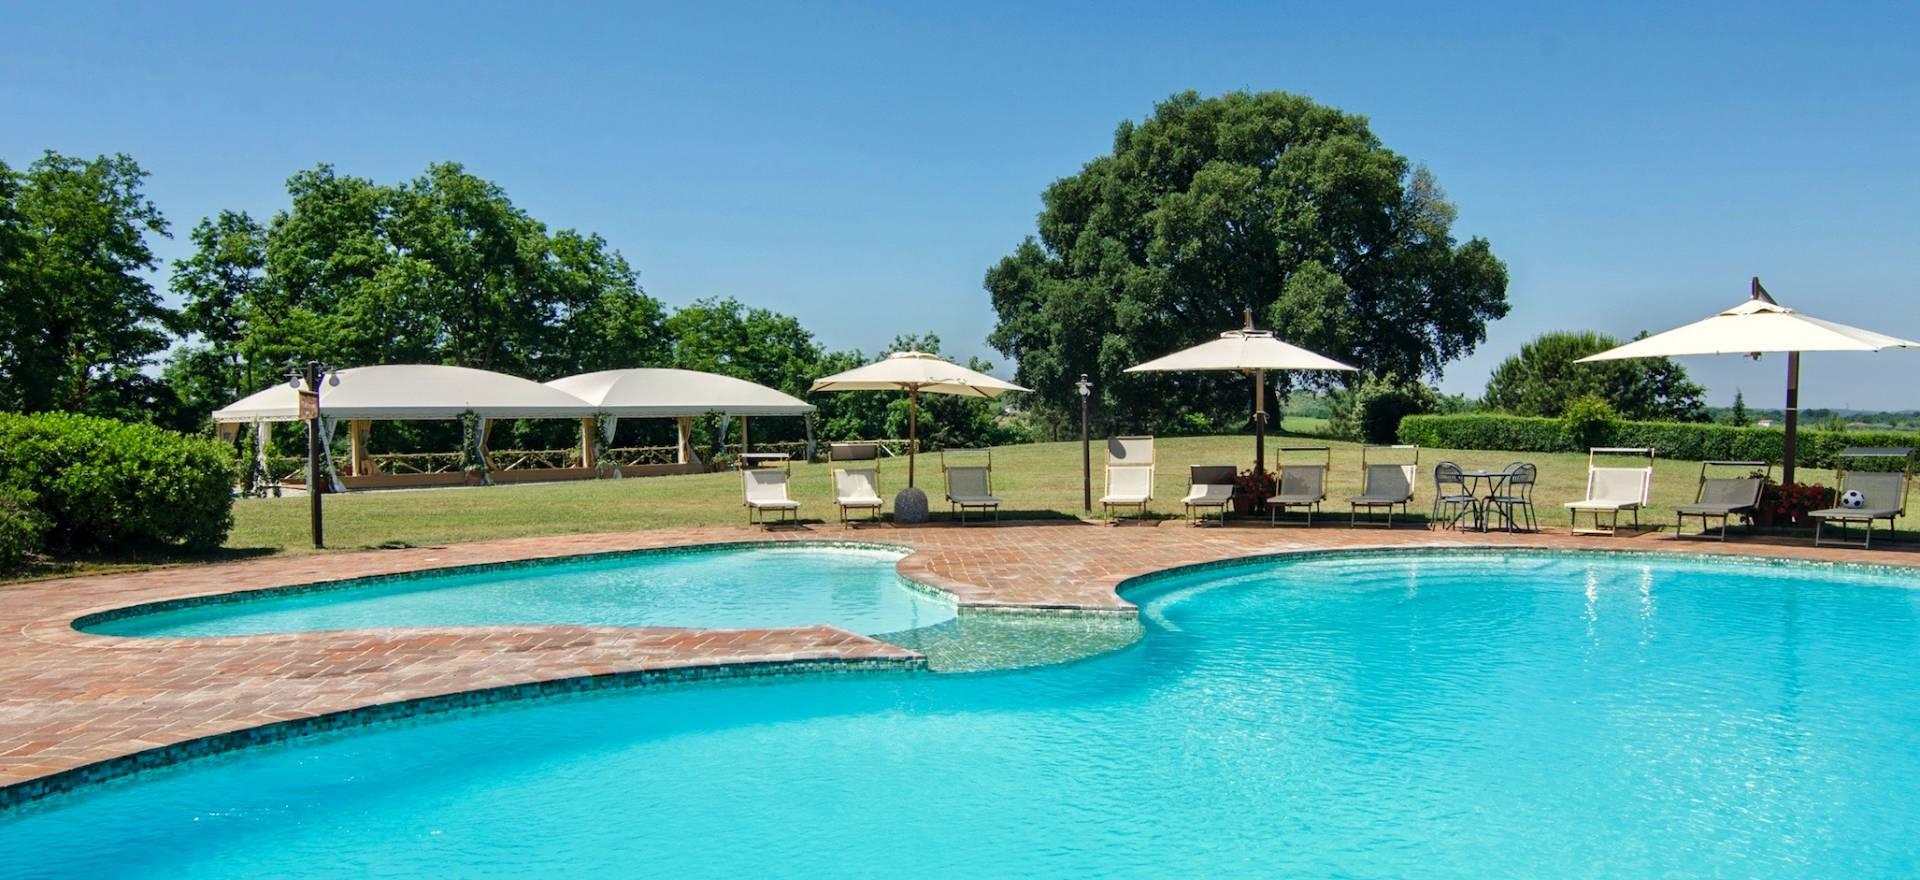 Agriturismo con piscina panoramica in toscana - Piscine in toscana ...